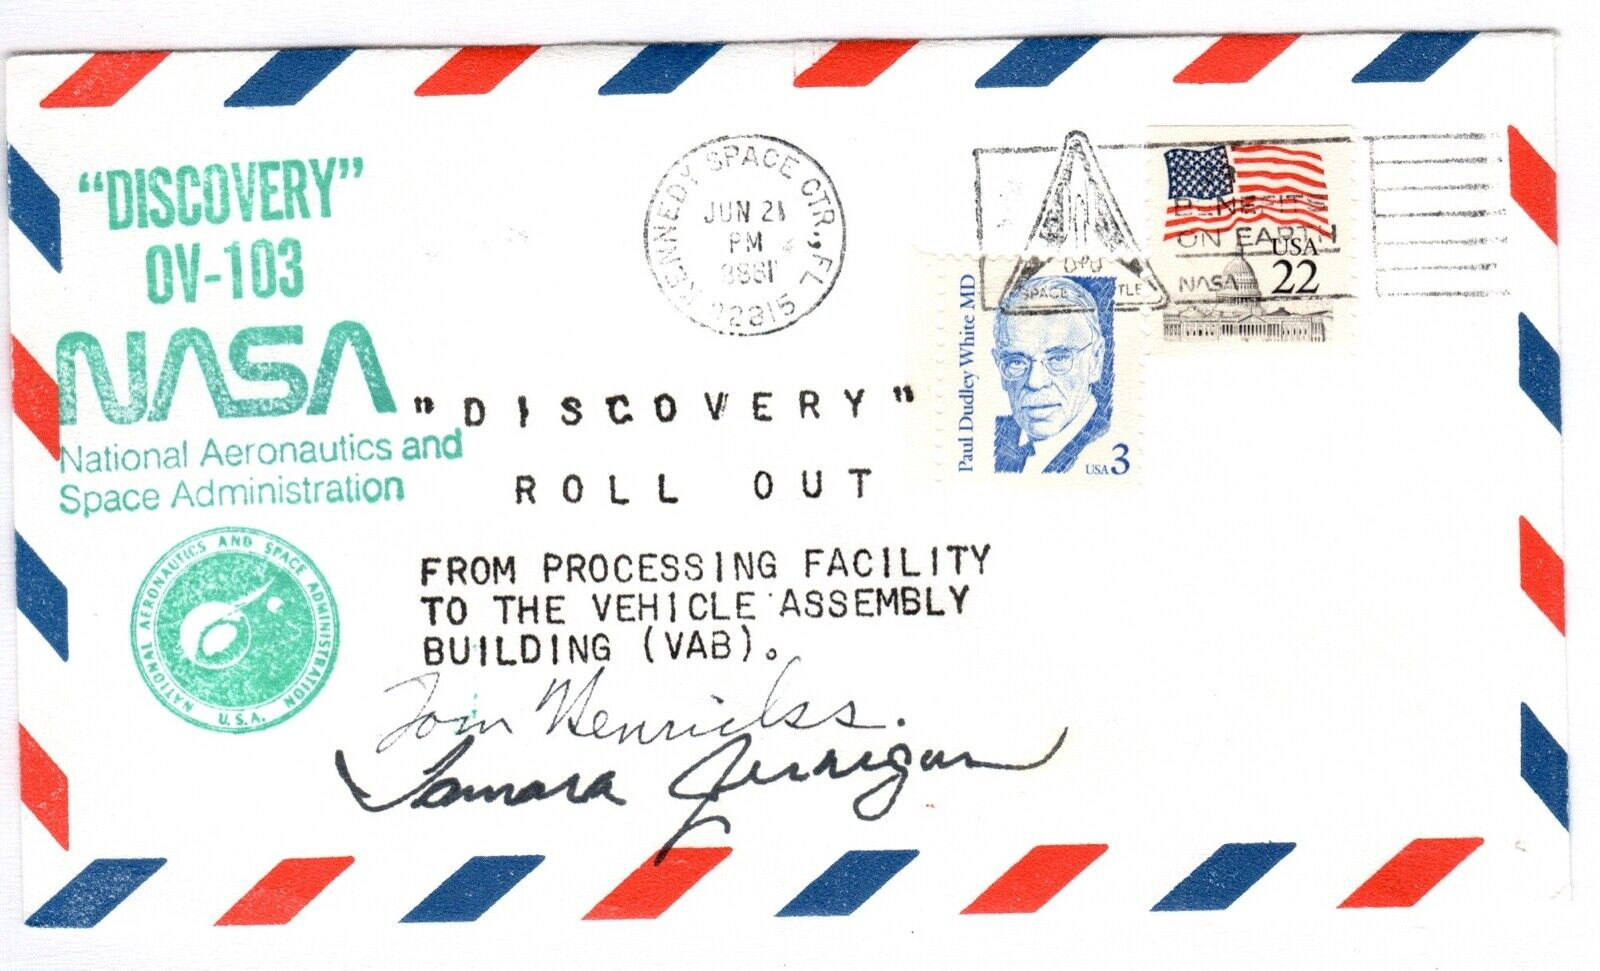 s l1600 - NASA Astronauts Tamara Jernigan & Tom Henricks autographs on OV-103 cover